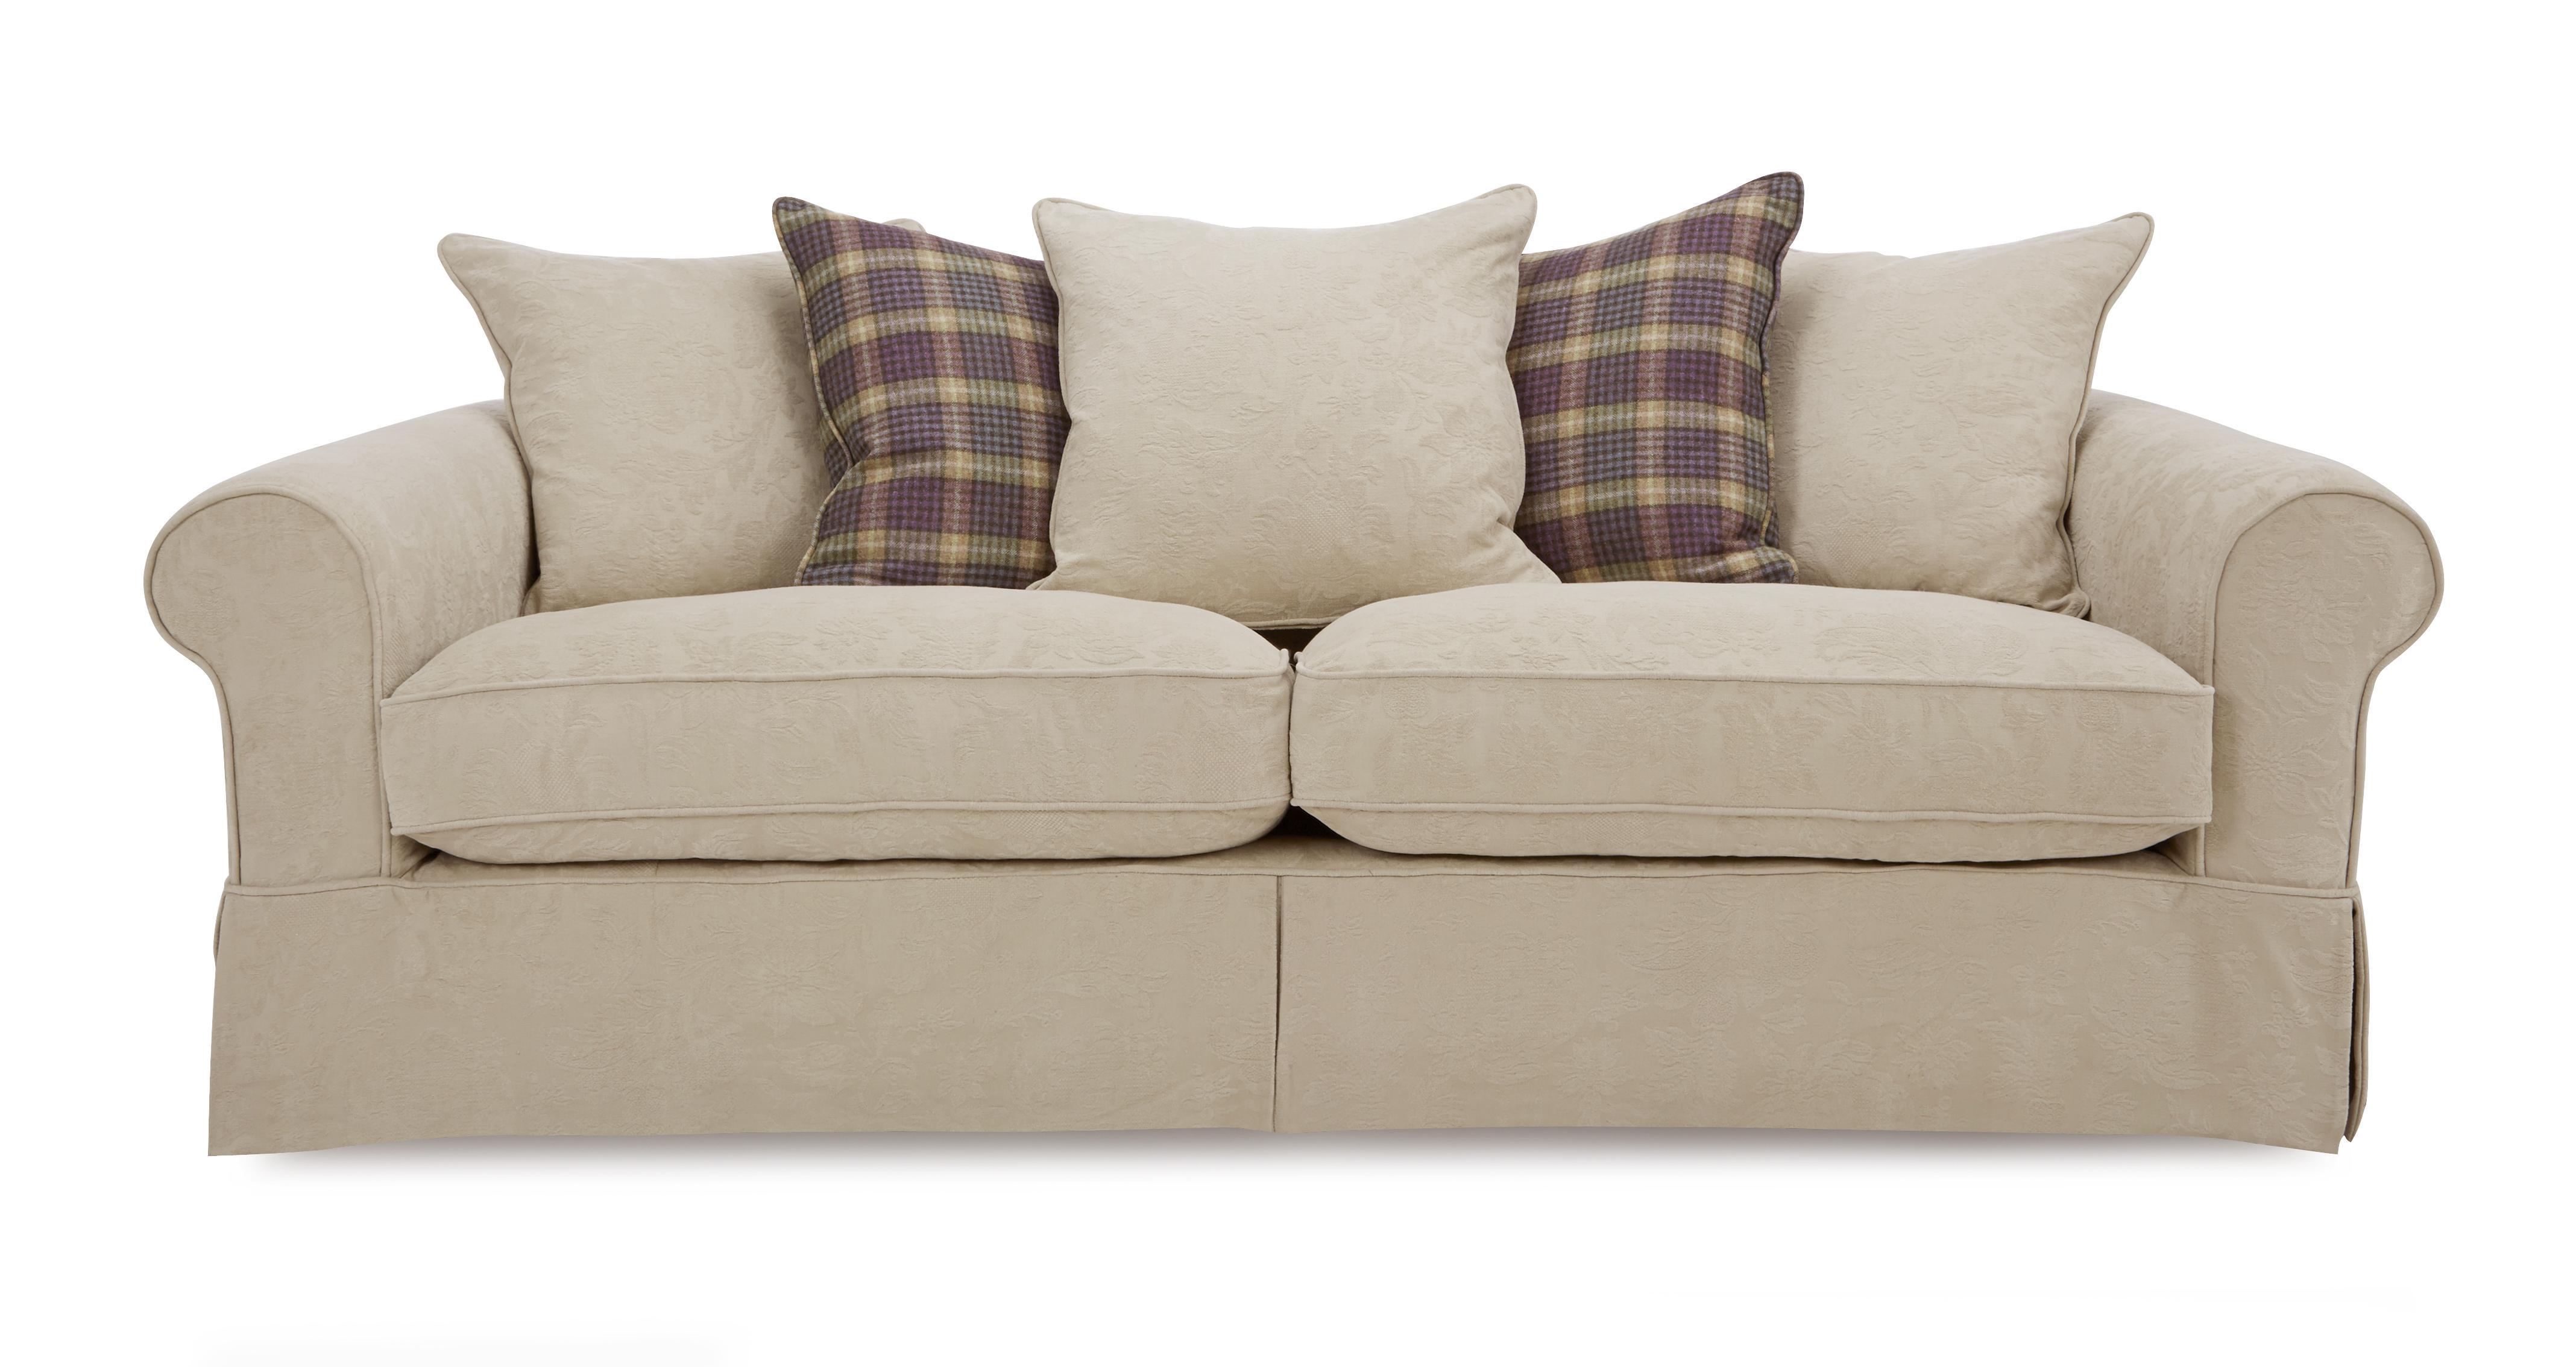 Kendal Pattern and Plaid Pillow Back Grand Sofa Kendal Pattern